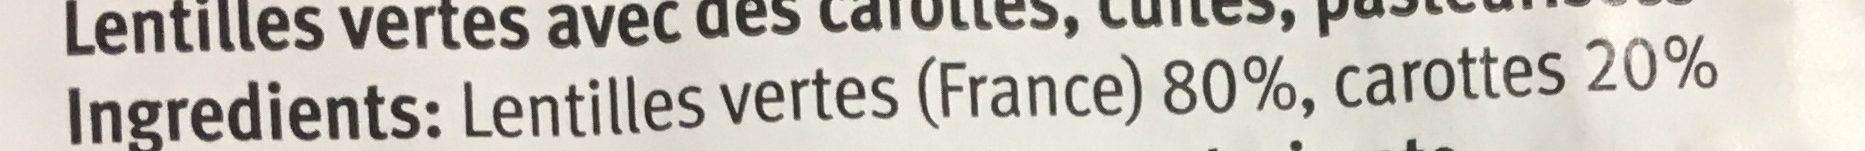 Lentilles vertes carottes - Ingredienti - fr